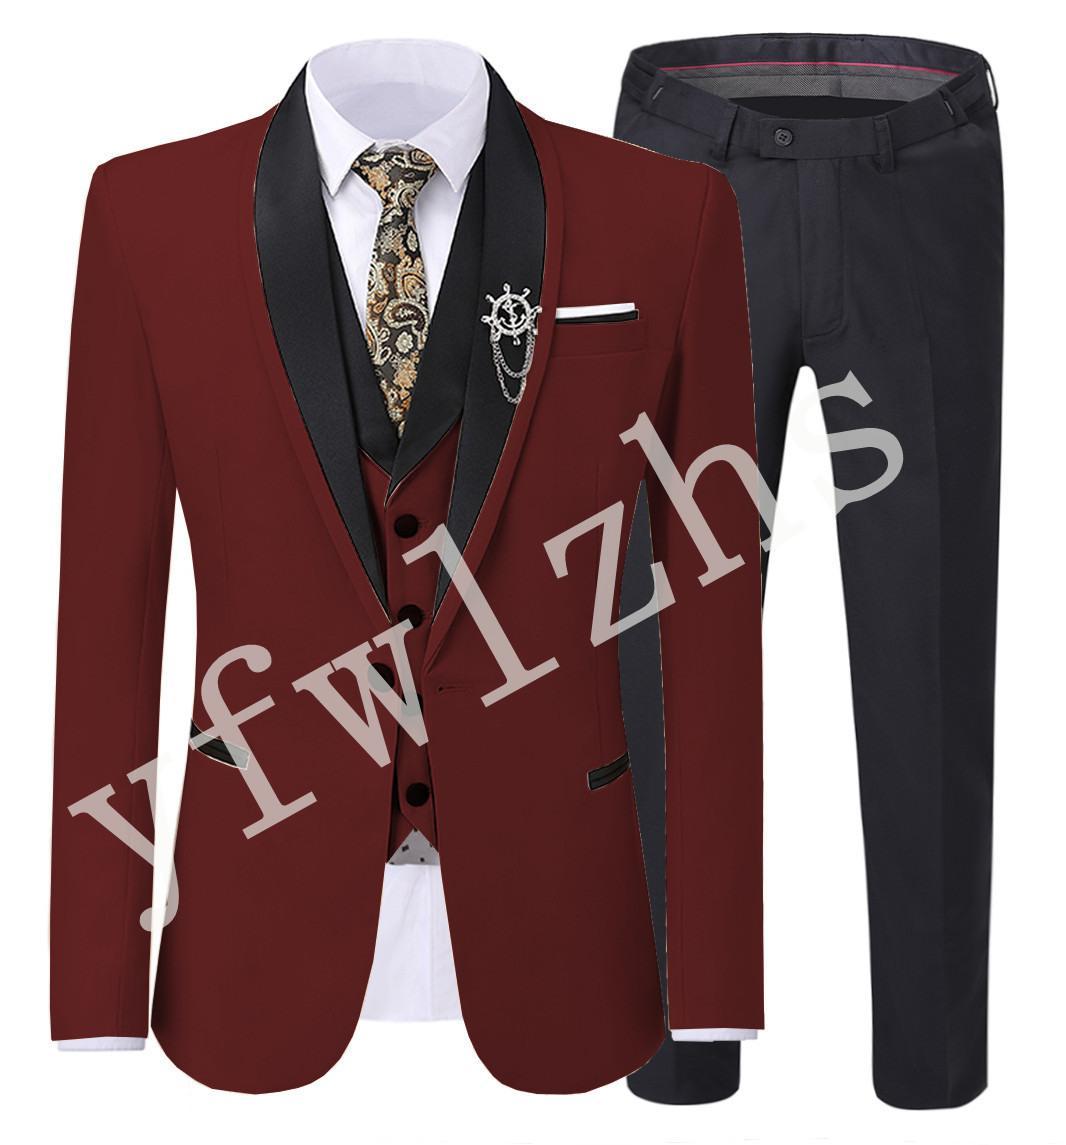 Classic One Button Handsome Groomsmen Shawl Lapel Groom Tuxedos Men Suits Wedding/Prom Best Man Blazer ( Jacket+Pants+Vest+Tie) W330